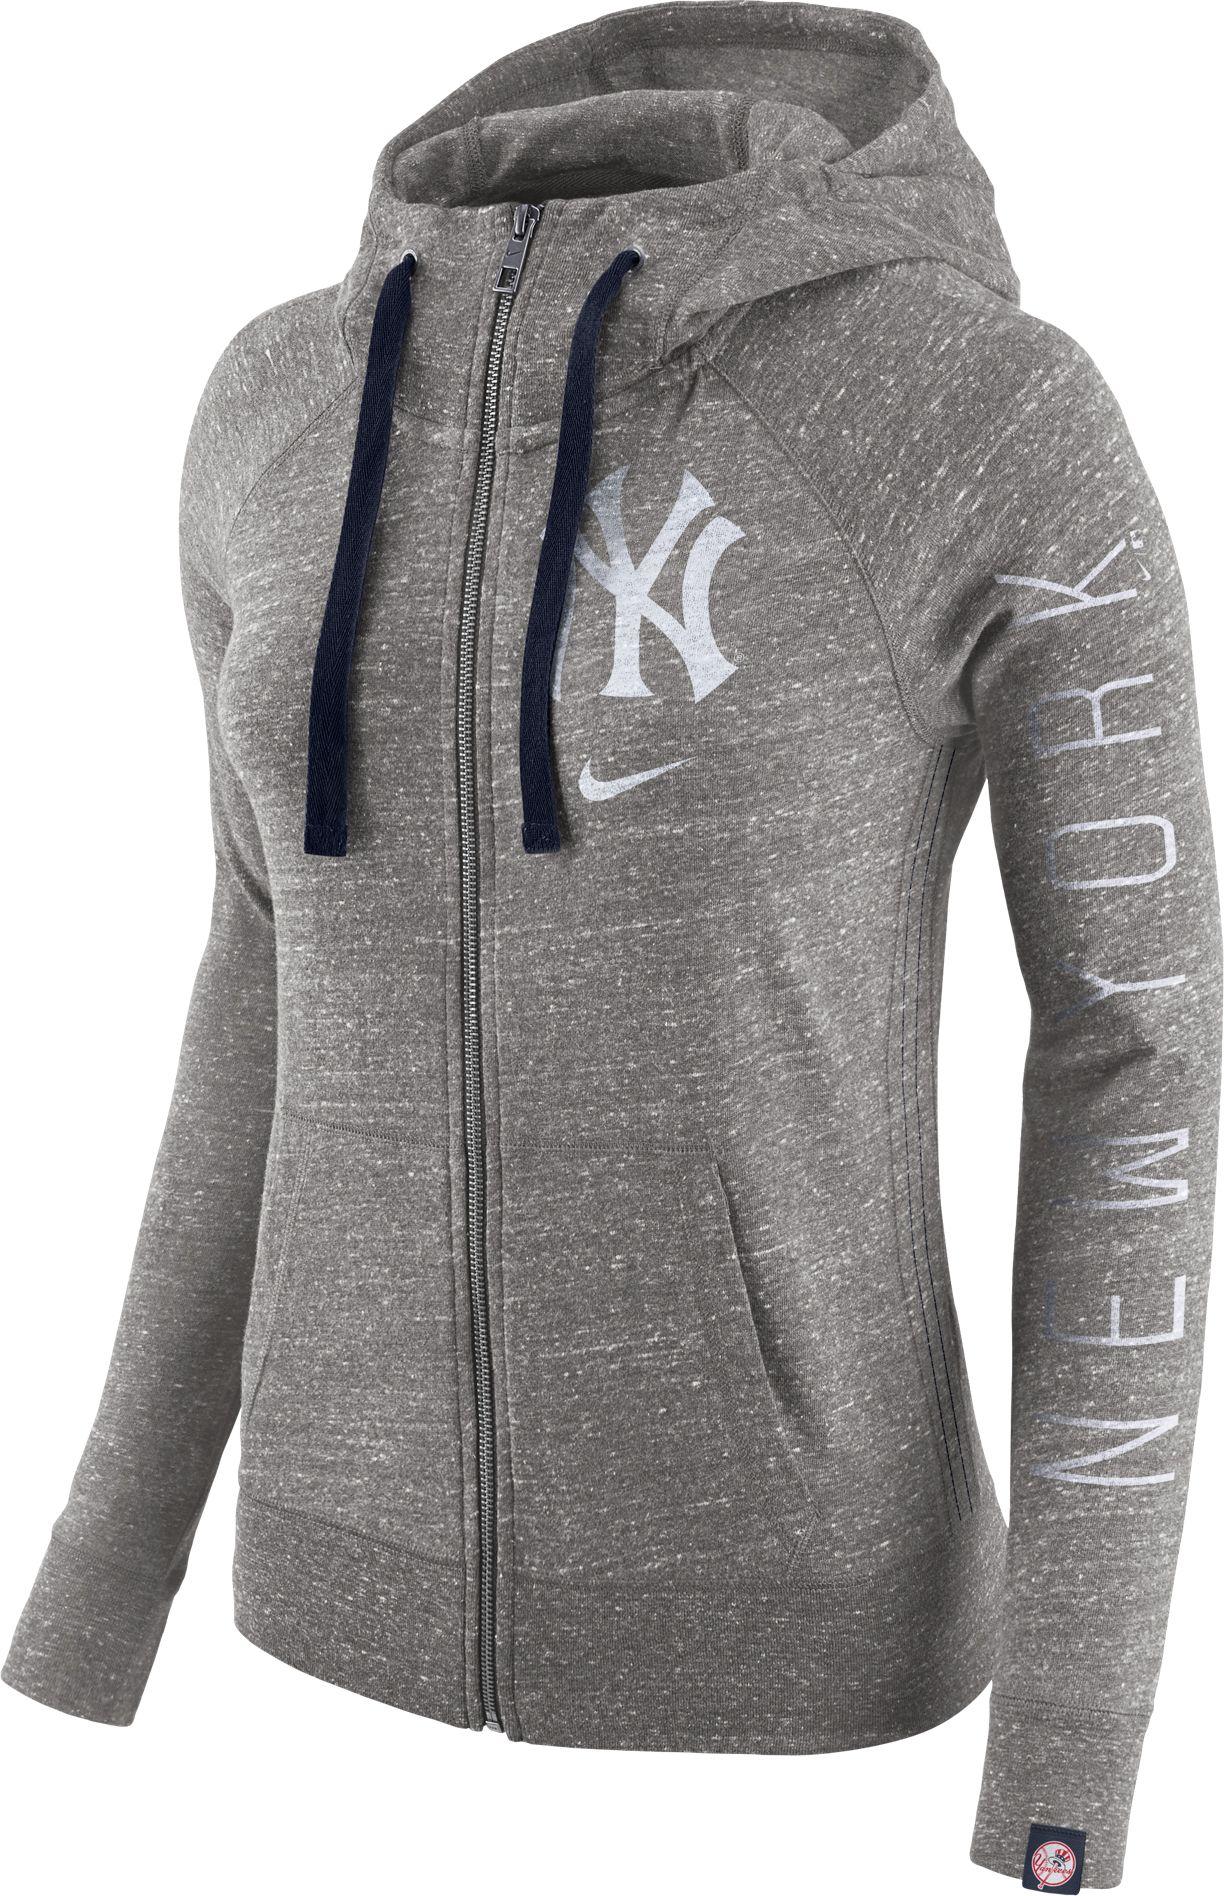 on sale b6b51 5622b Shoptagr | Nike Women's New York Yankees Vintage Full Zip ...